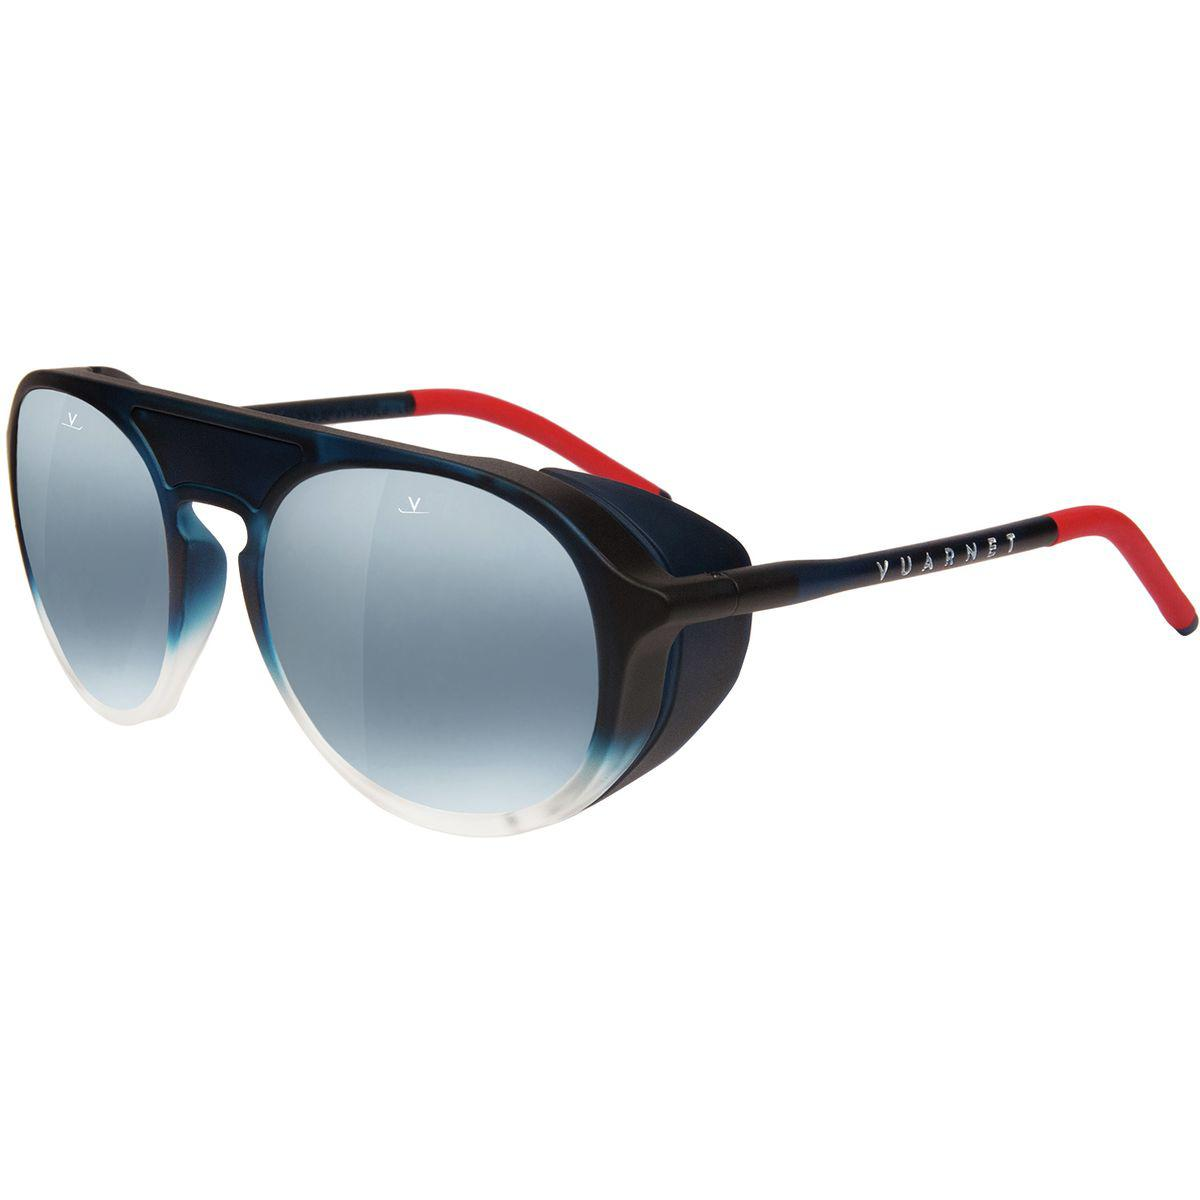 ec4a91496e0 Lyst - Vuarnet Ice Sunglasses - Polarized in Blue for Men